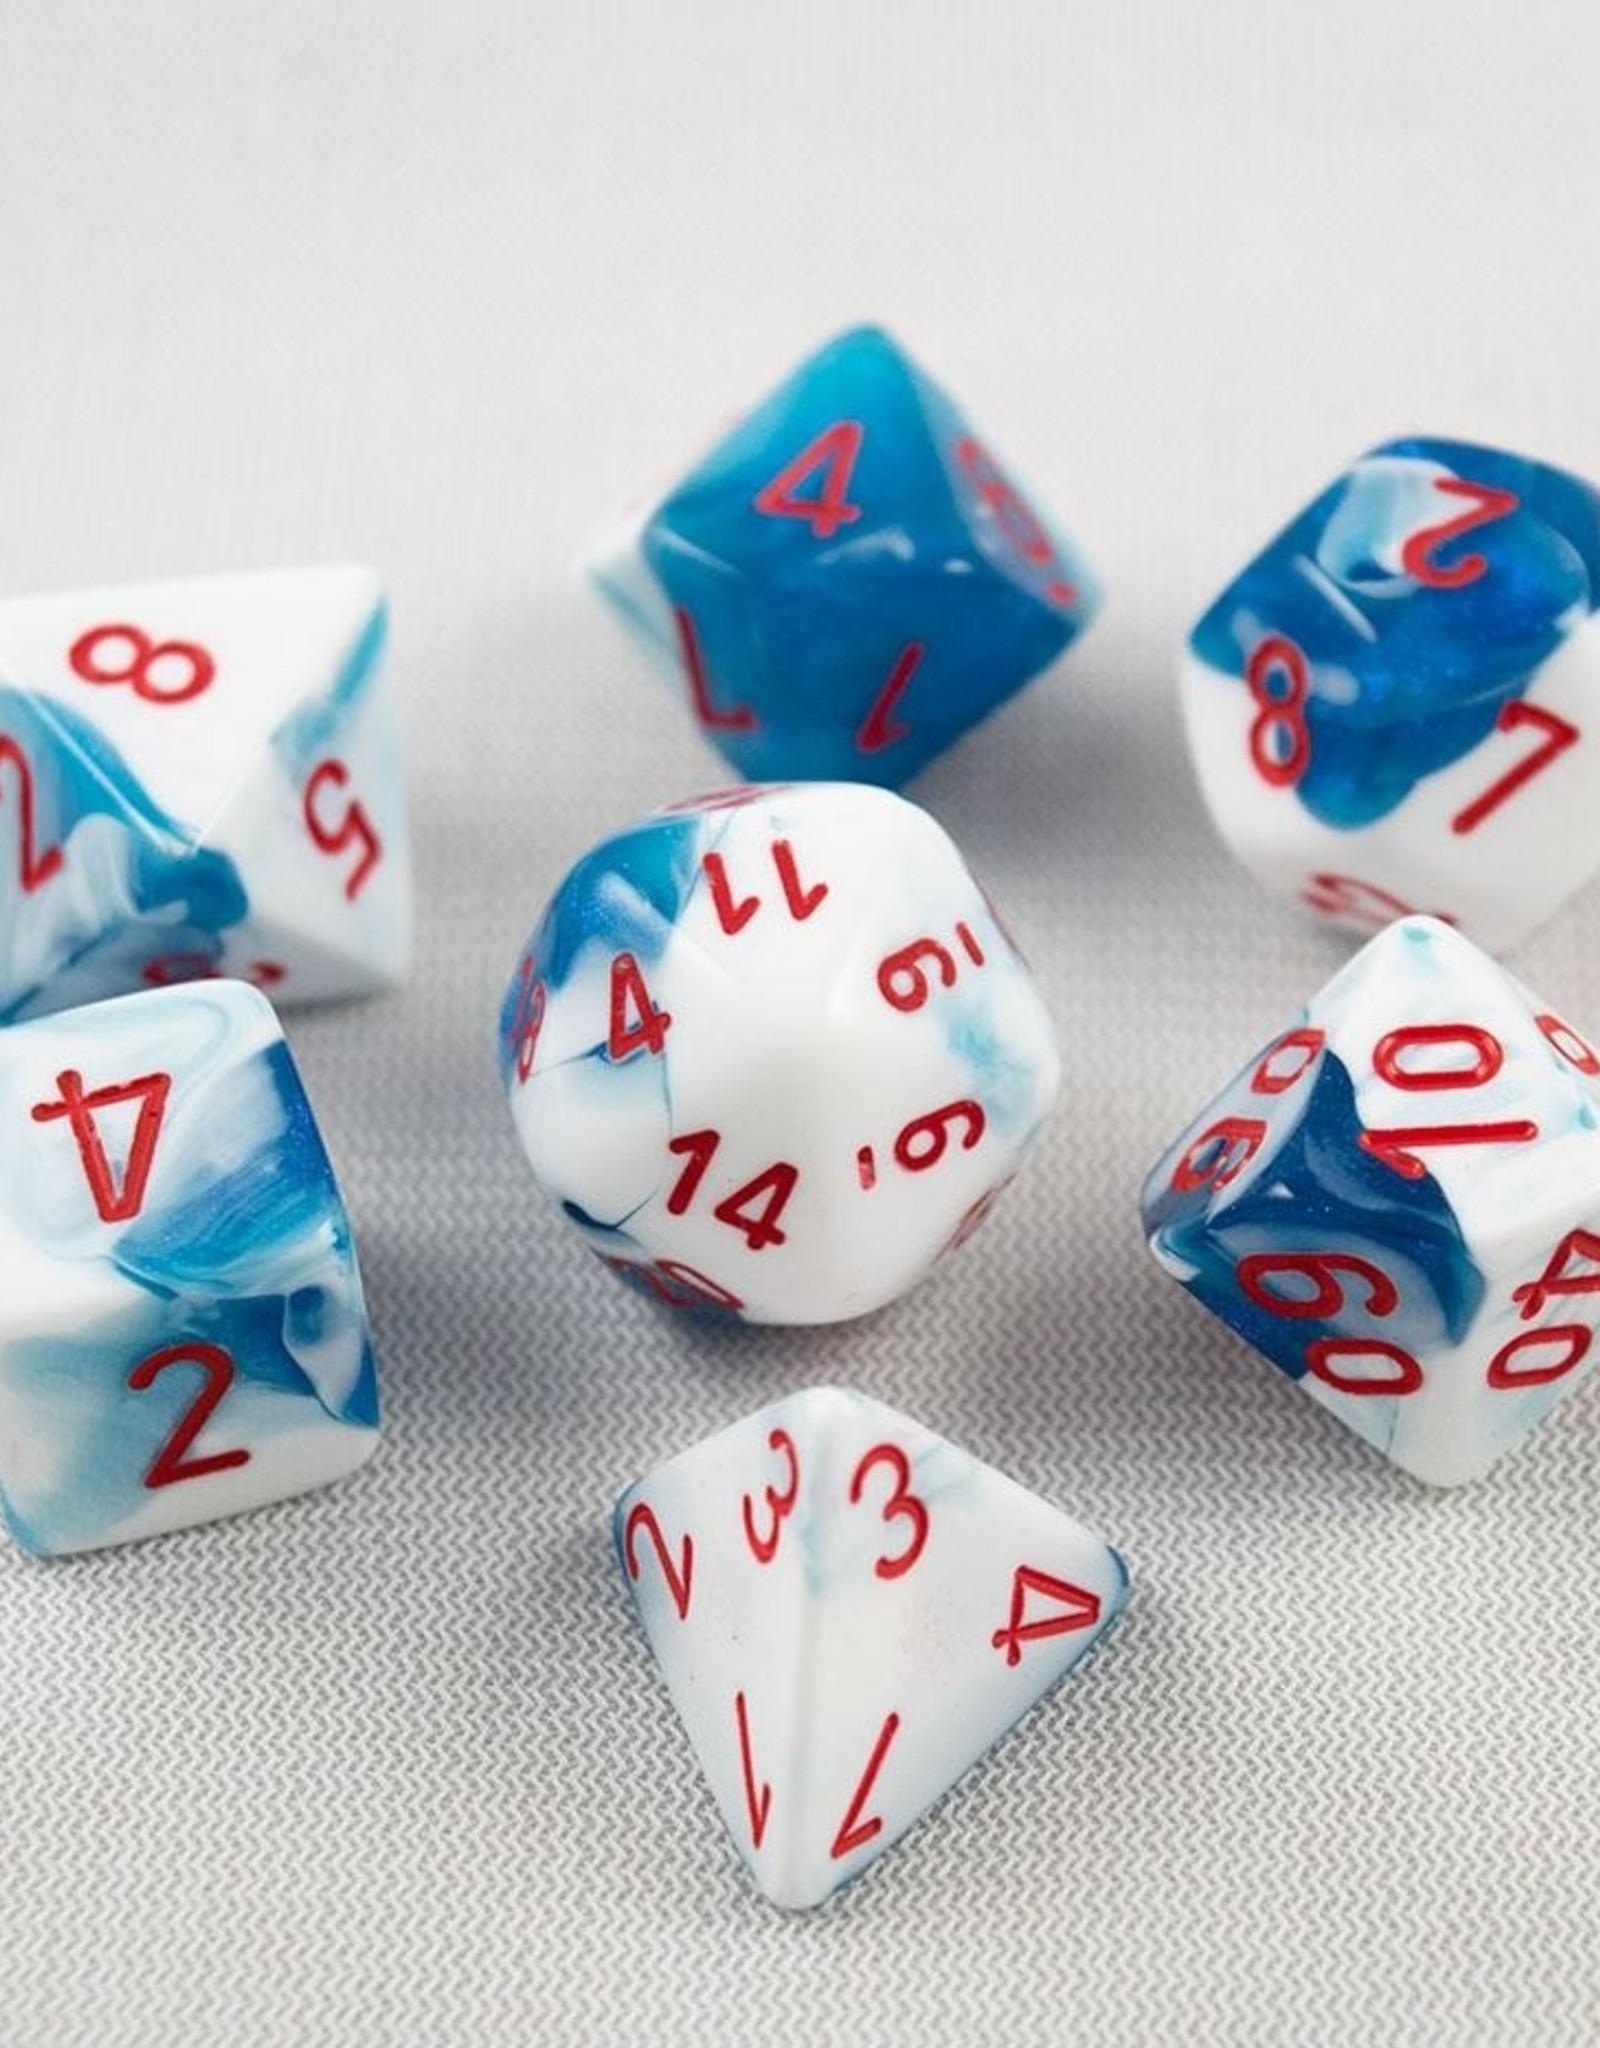 Chessex Chessex 7-Die set Gemini - Astral Blue-White/Red